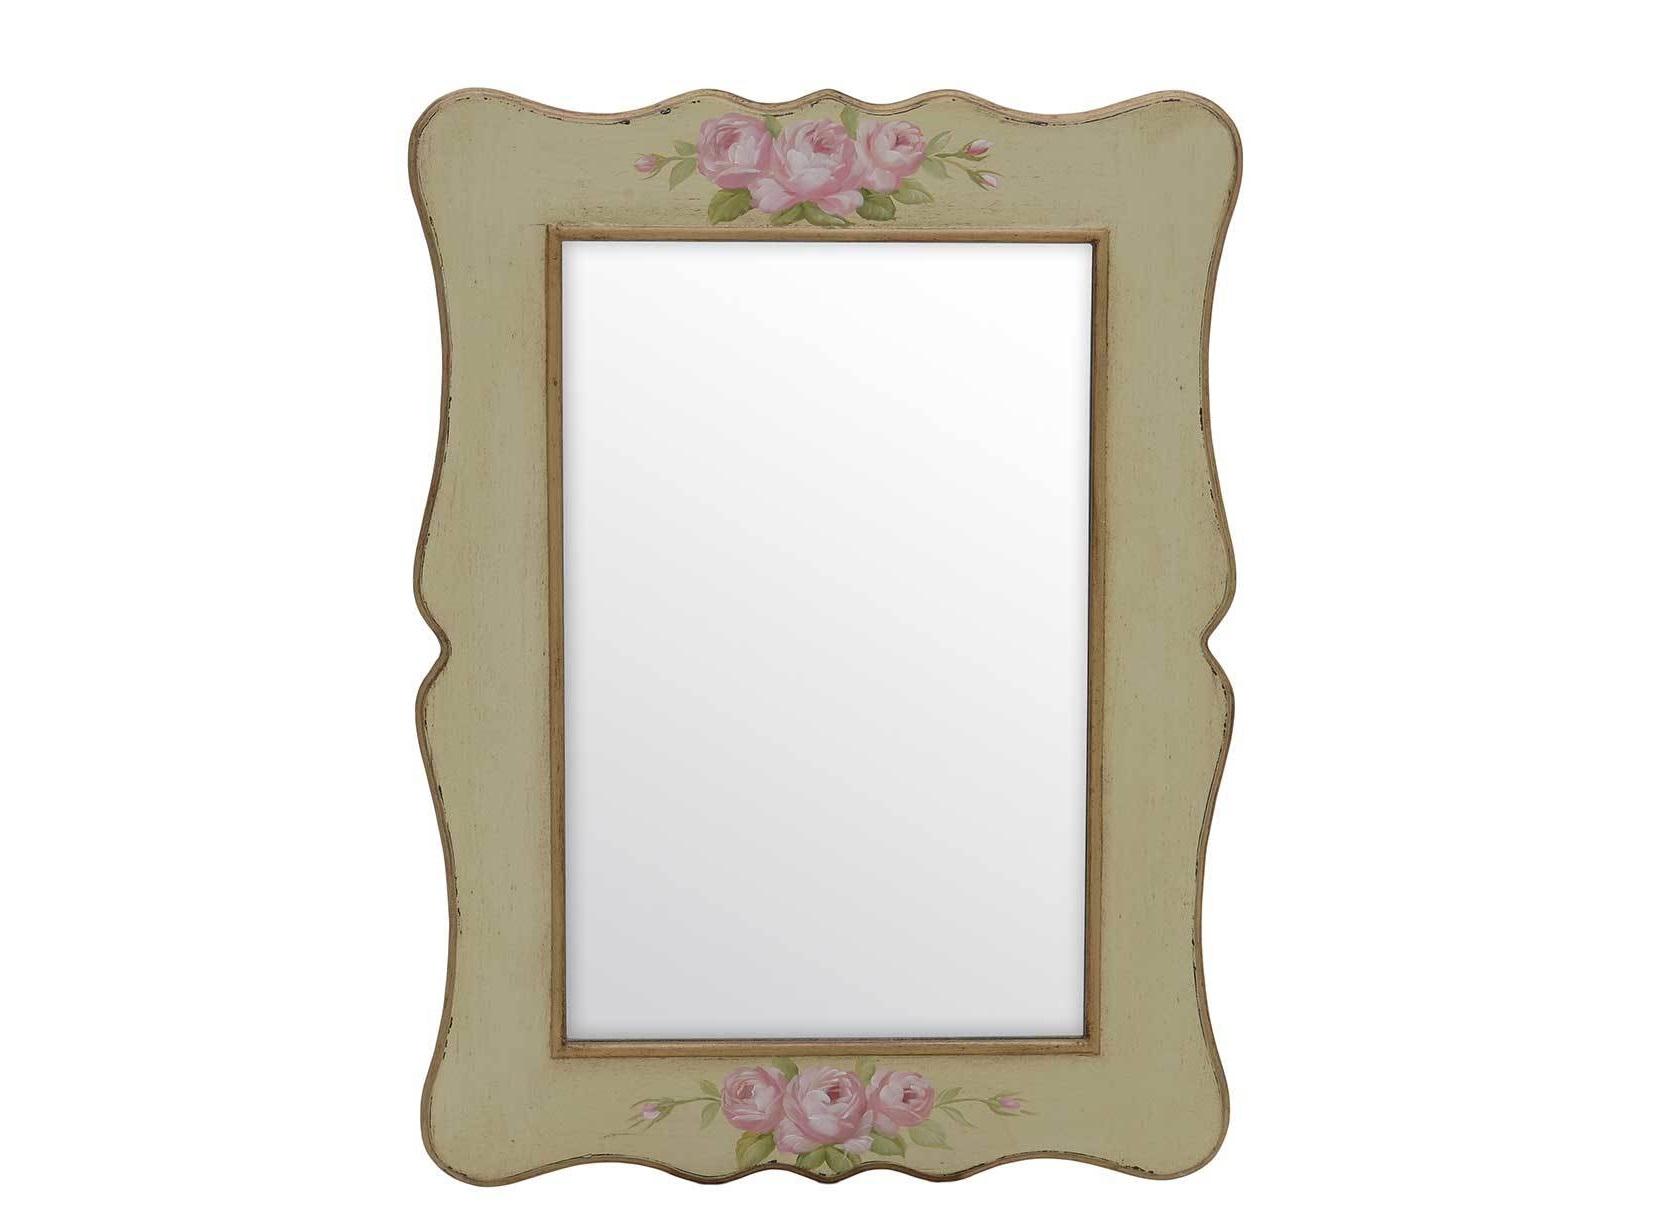 Зеркало настенное EtrenaНастенные зеркала<br><br><br>Material: Дерево<br>Ширина см: 60<br>Высота см: 80<br>Глубина см: 2